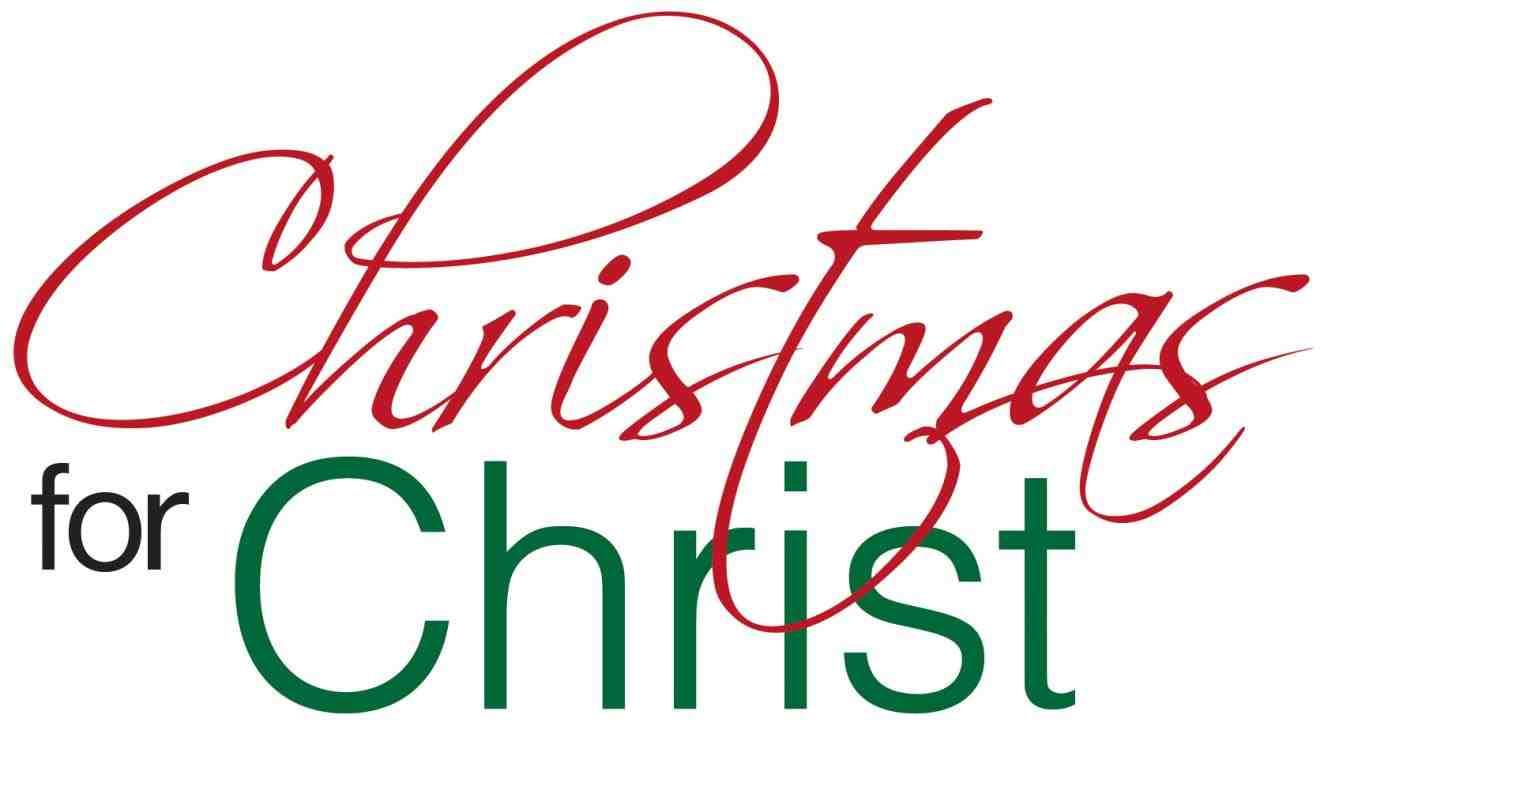 Christian Religious Clipart | Free